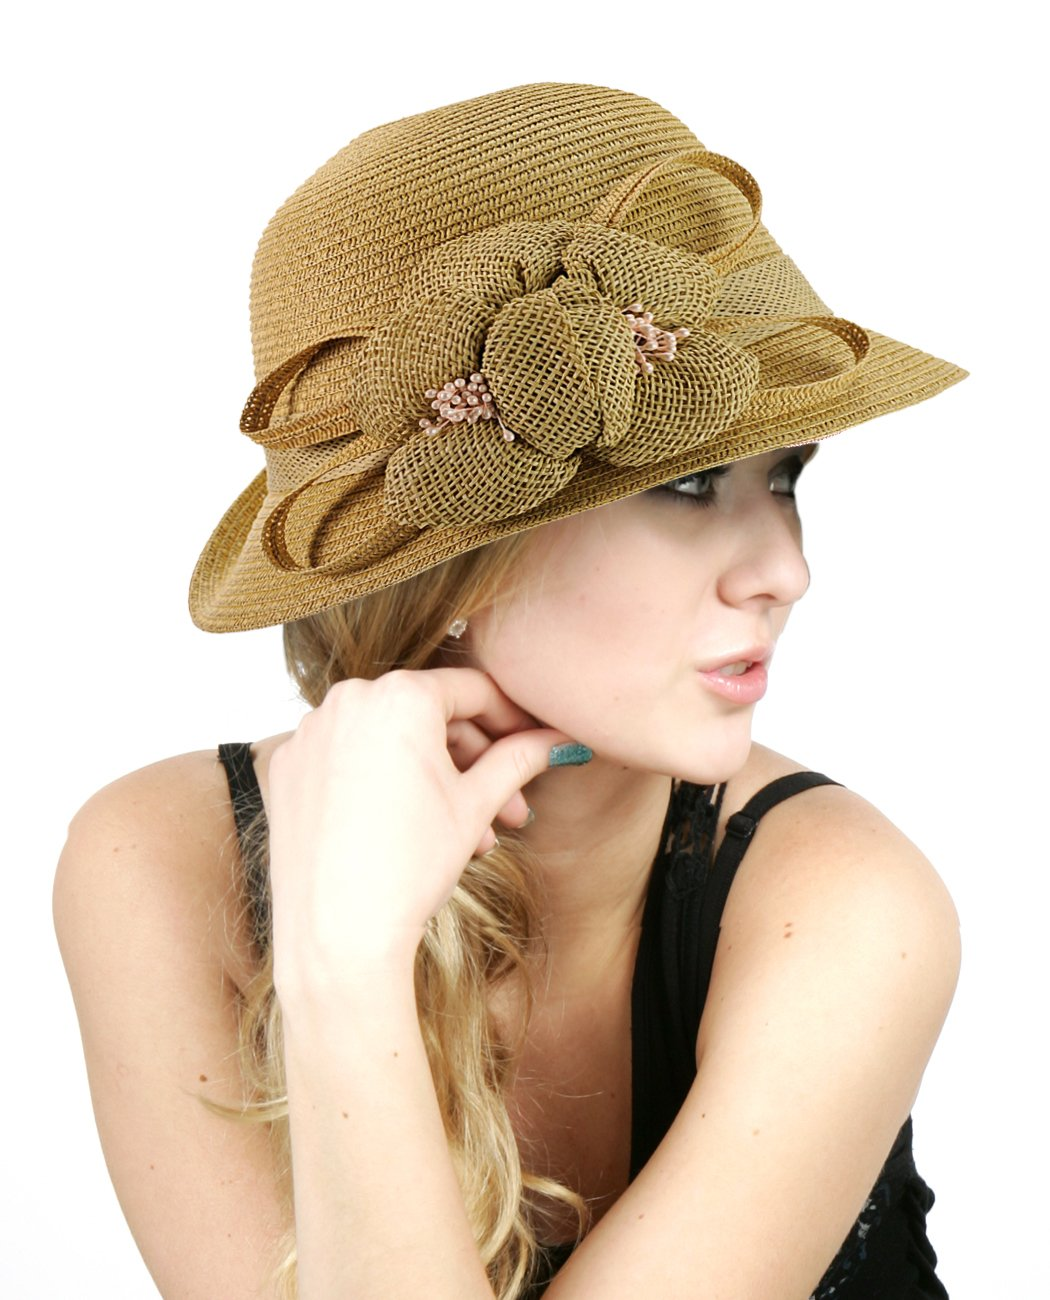 NYFASHION101 Side Flip Cloche Bucket Hat w/Woven Flower & Ribbon Accent, Natural